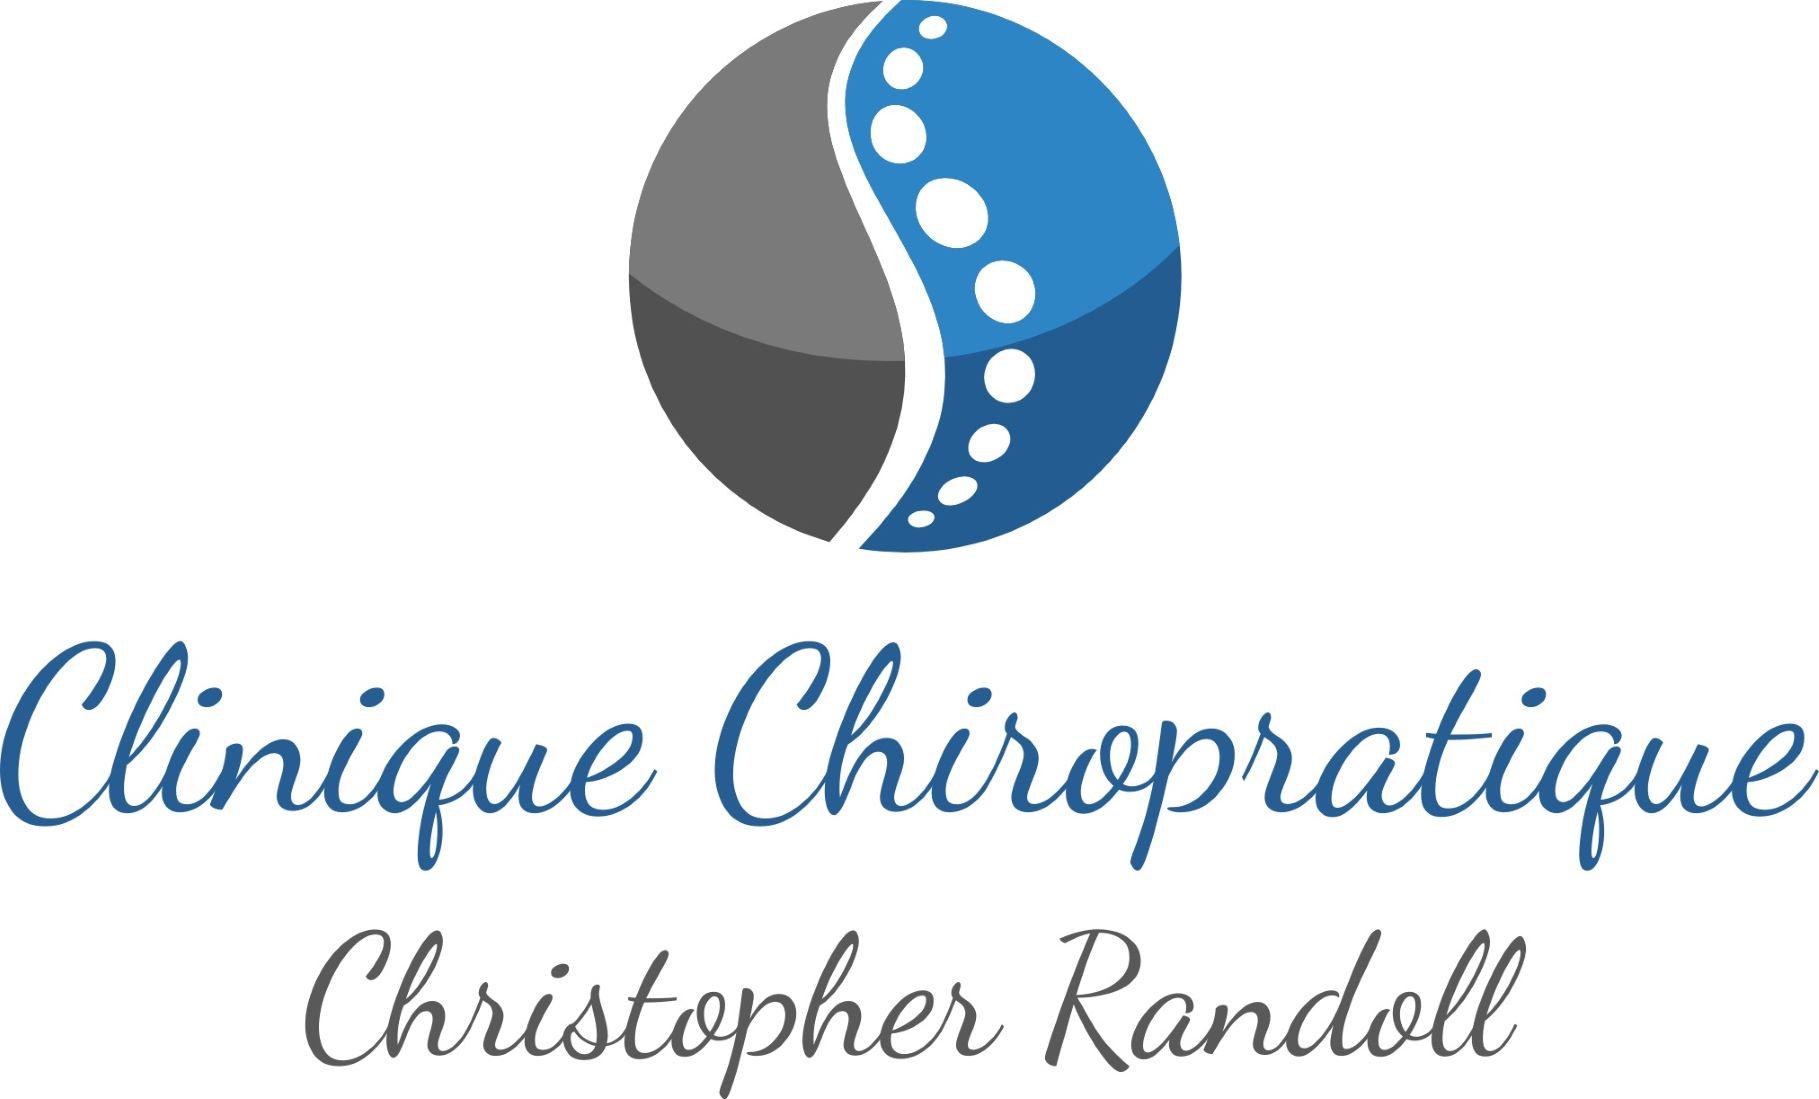 Dr Christopher Randoll